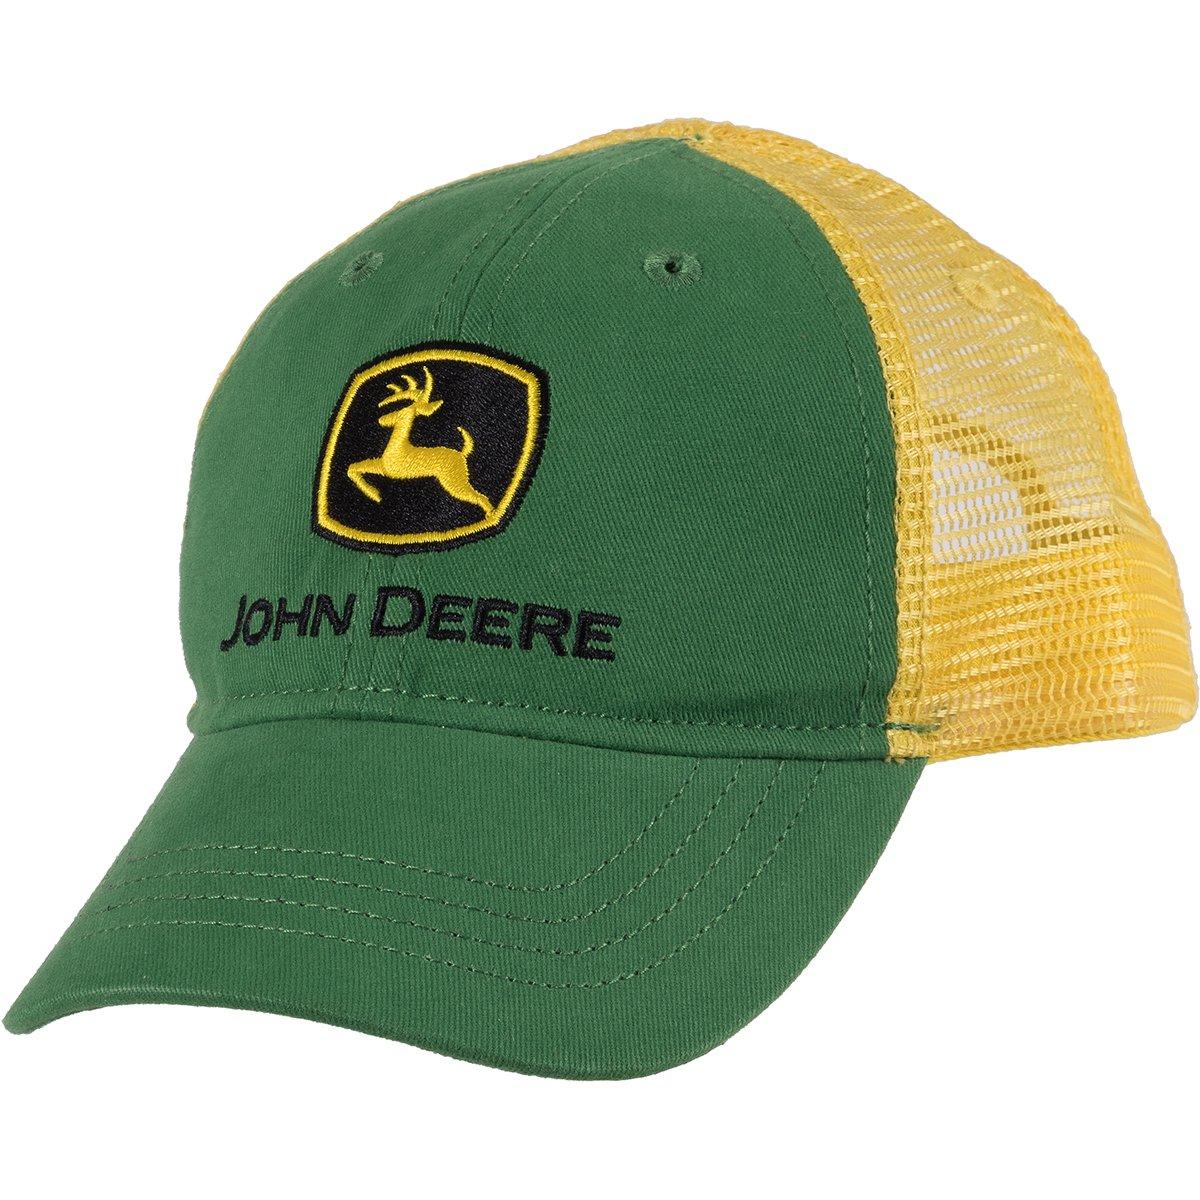 John Deere Toddler Boys' Trademark Trucker Ball Cap, Green, Toddler by John Deere